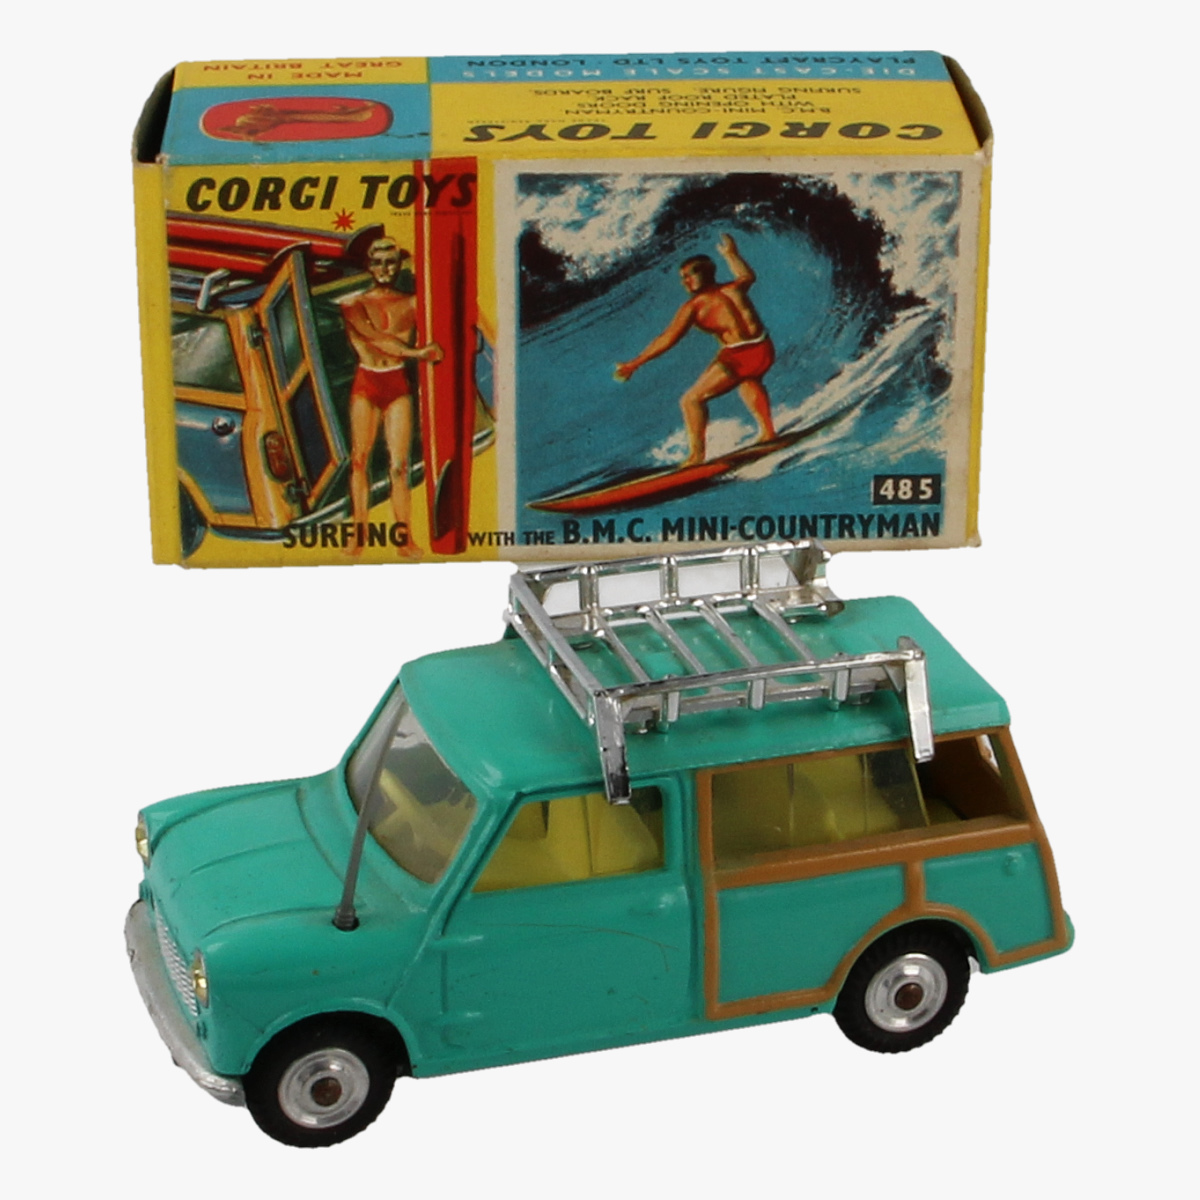 Afbeeldingen van Corgi Toys.Surfing With the B.M.C. Mini- Countryman. Nr. 485